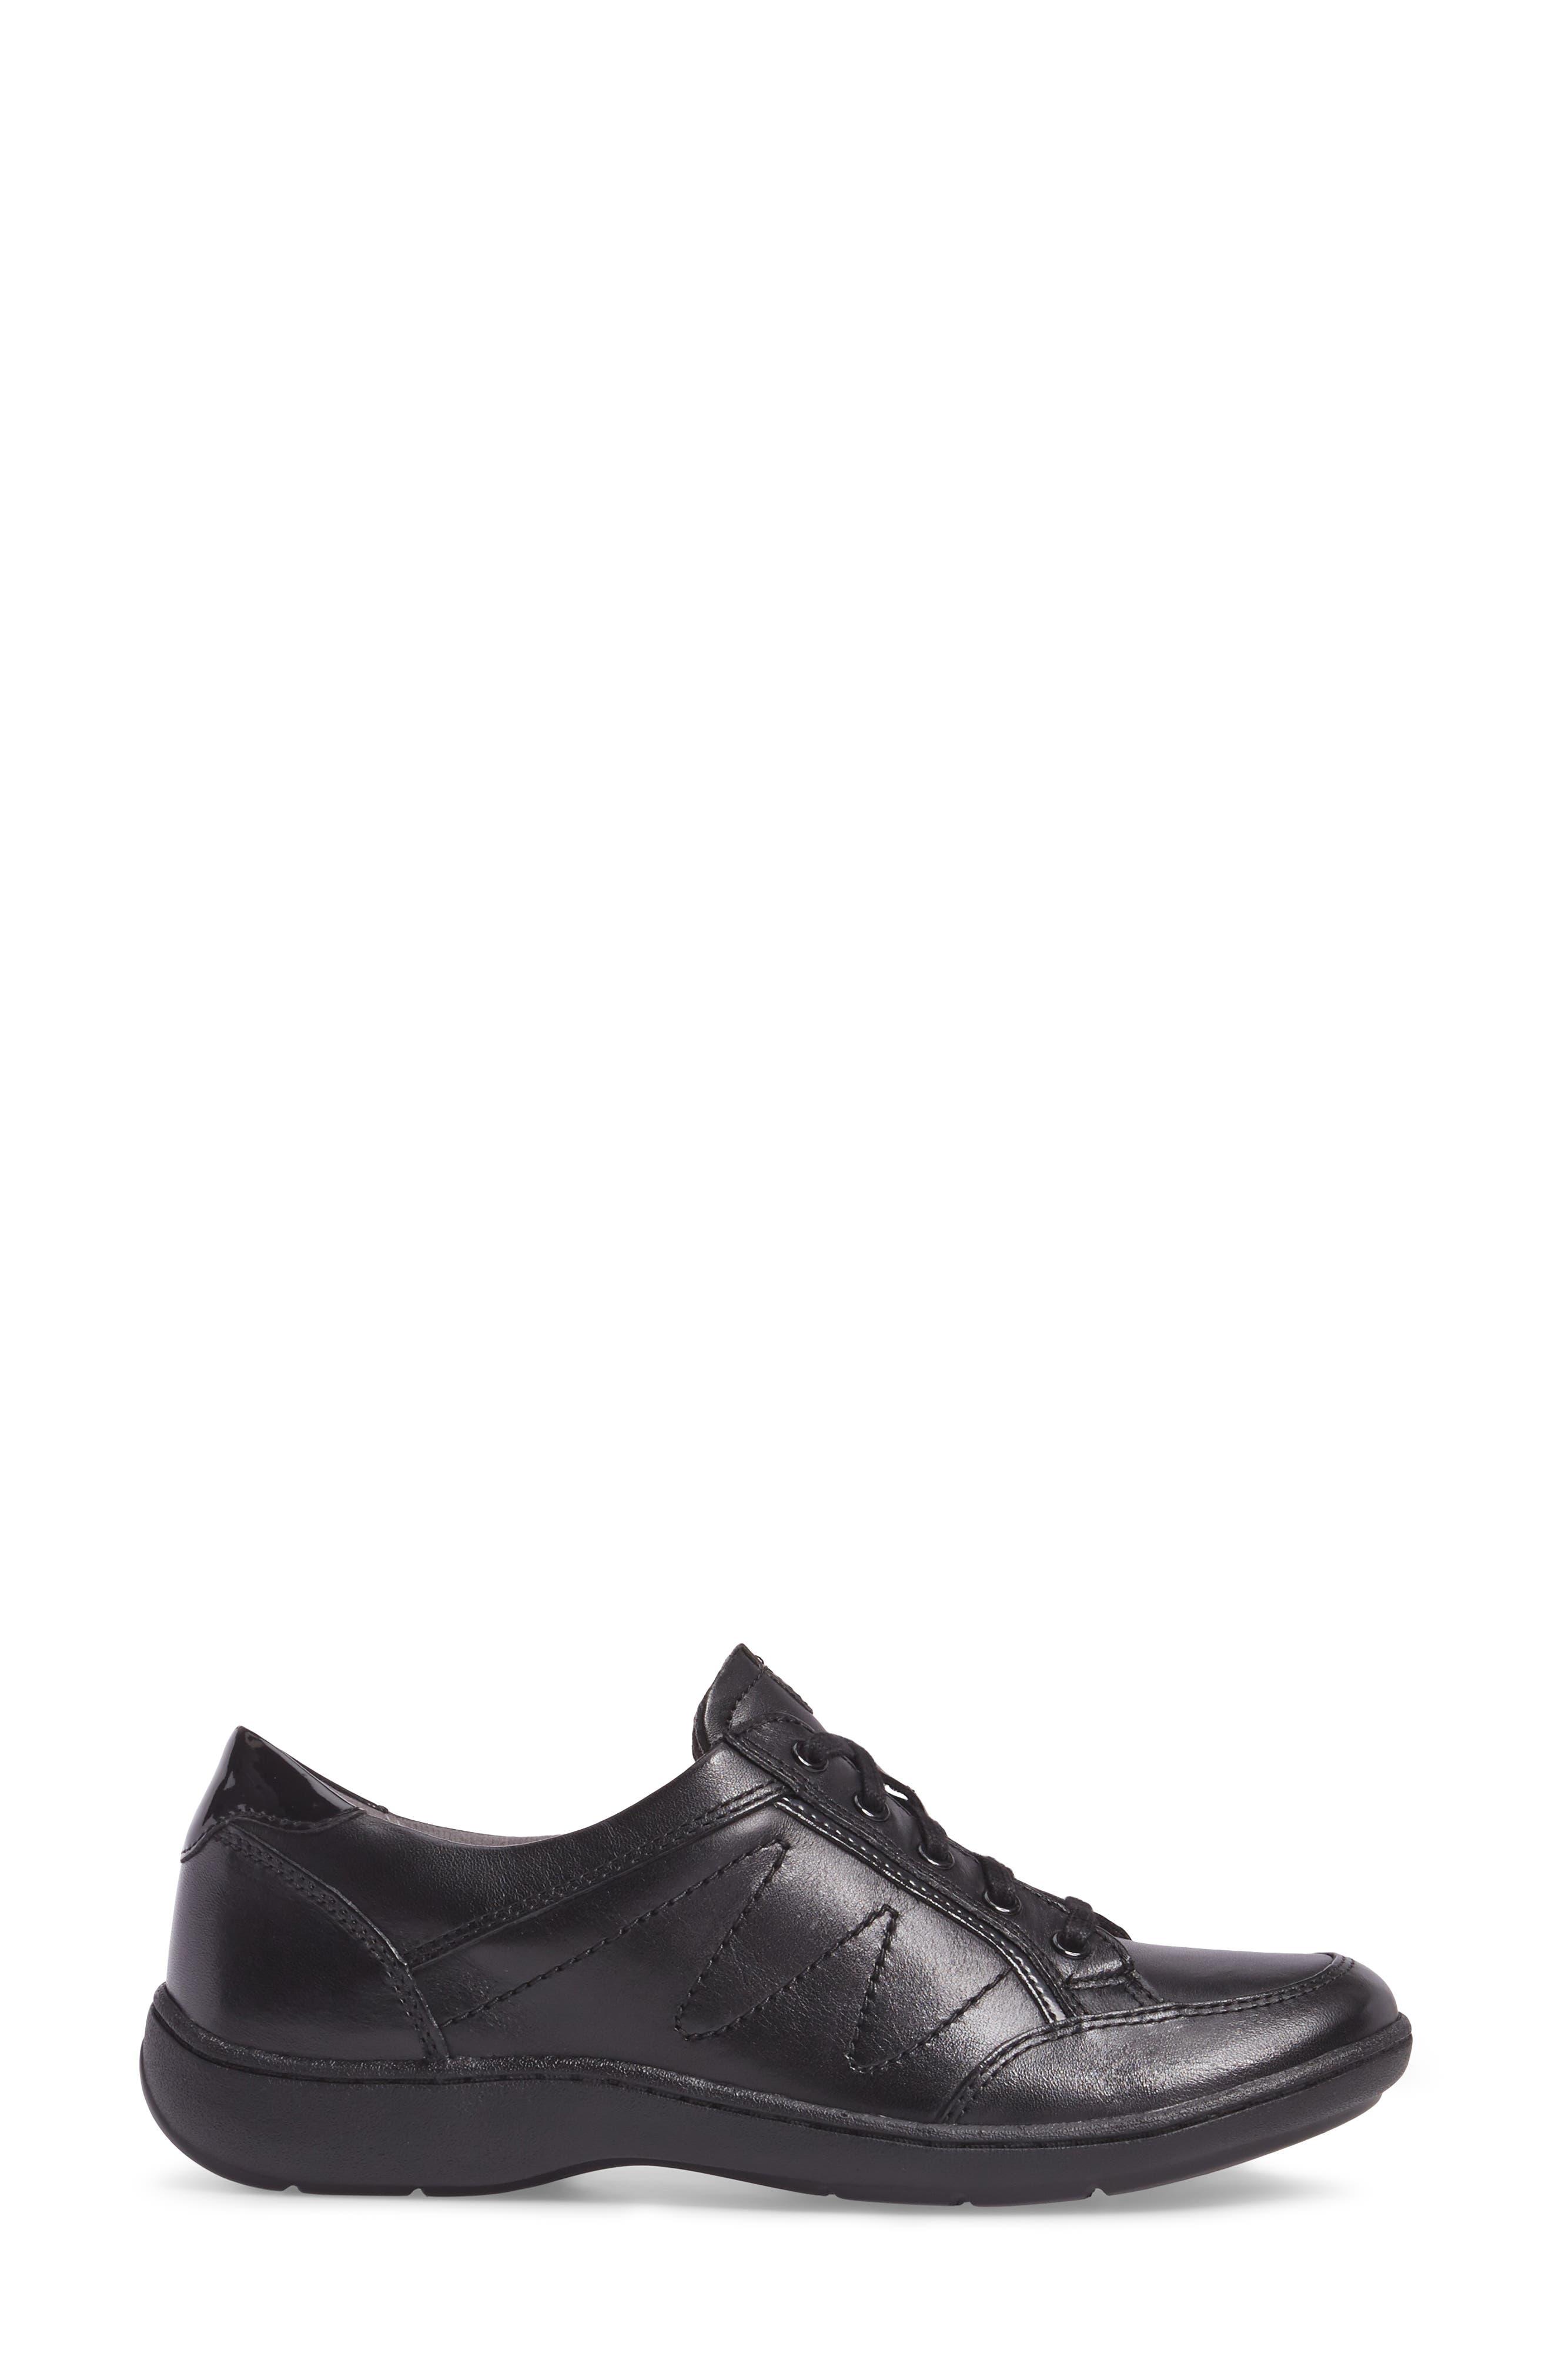 Bromly Sneaker,                             Alternate thumbnail 3, color,                             Black Leather